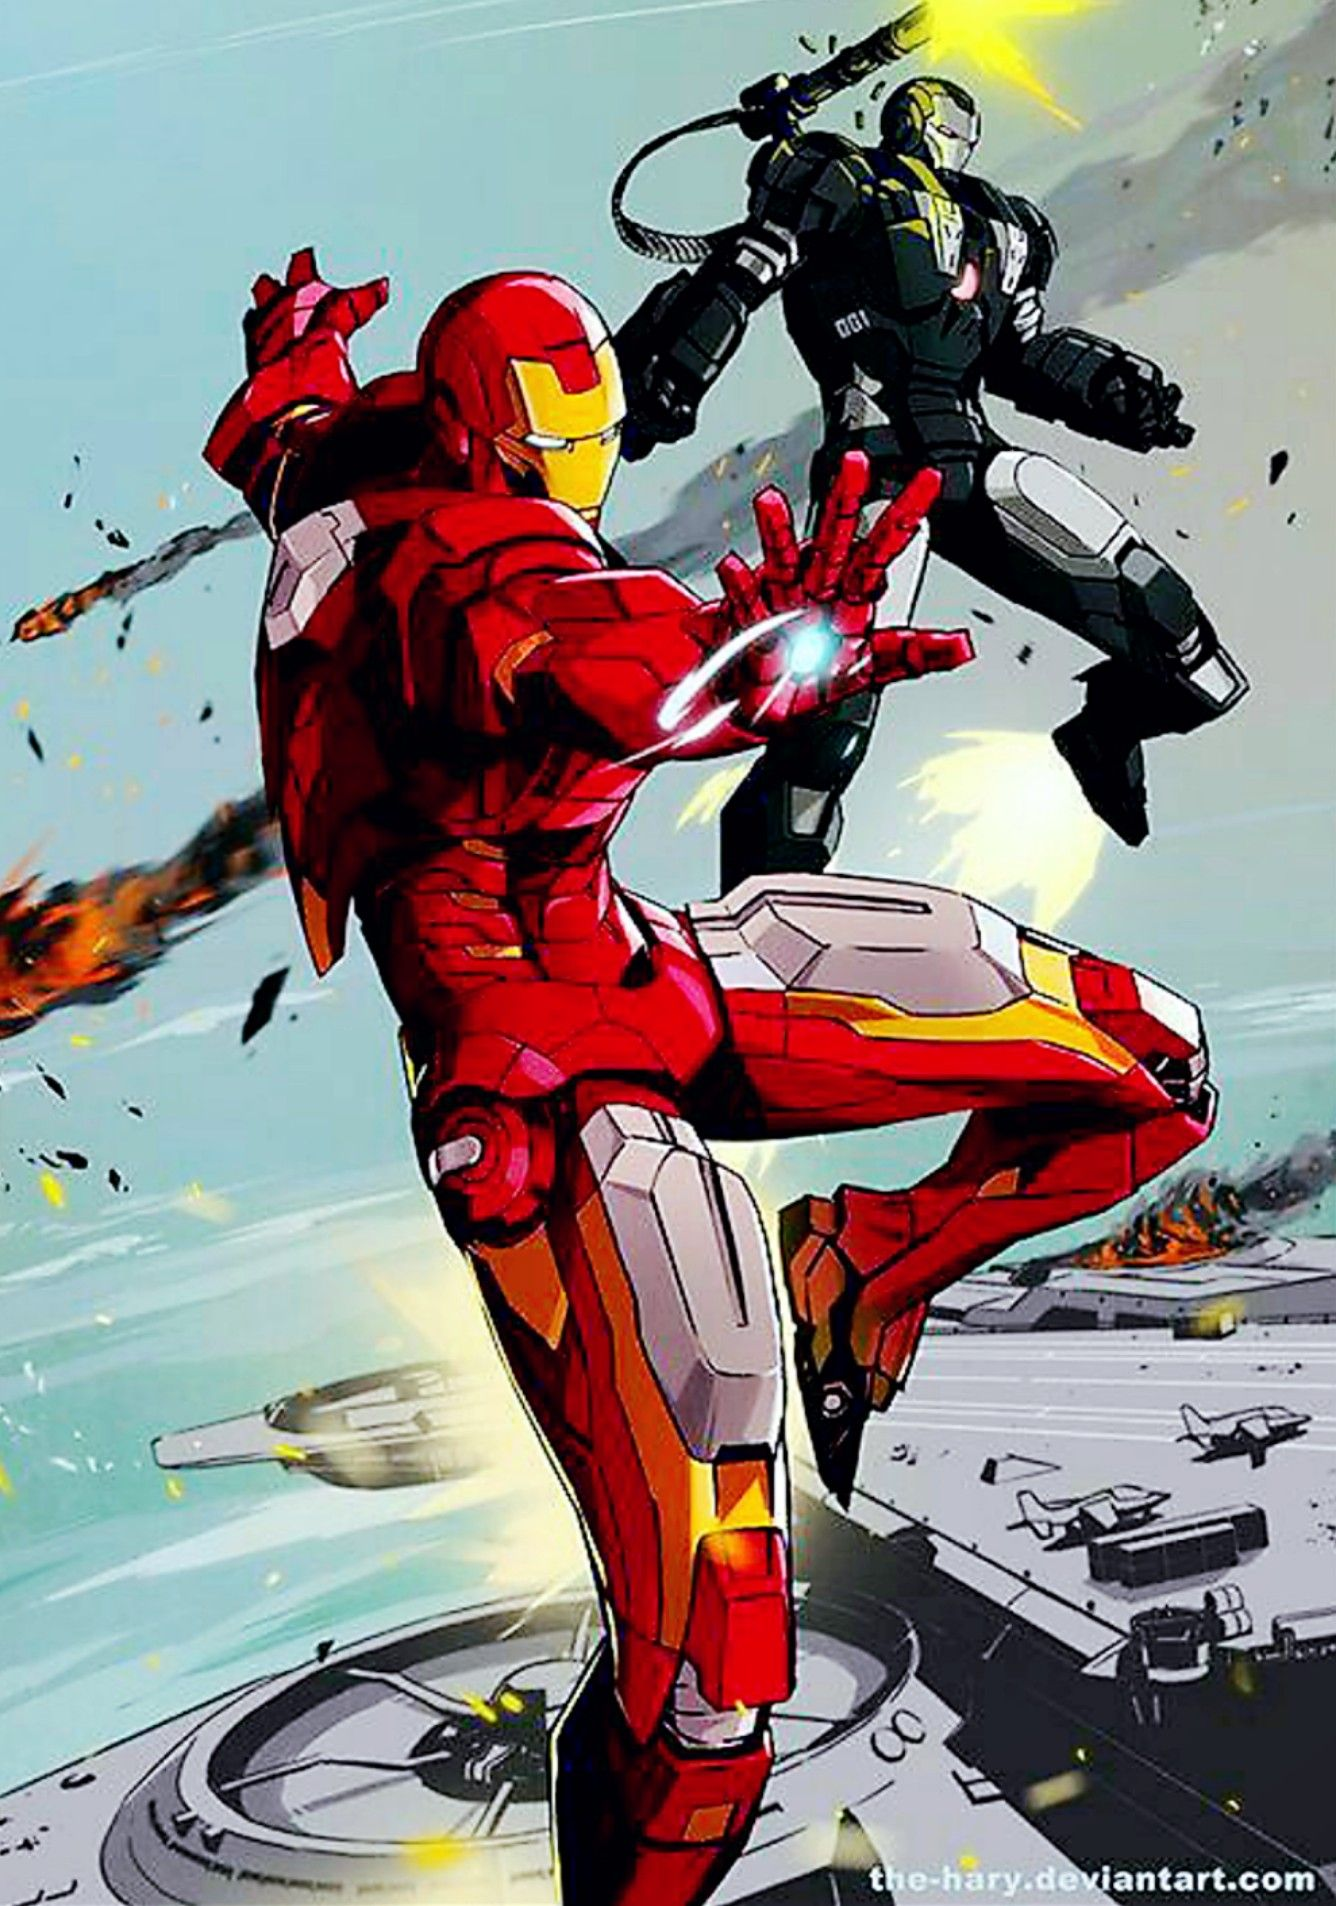 Ironman X War Machine Ironman Marvel Avengers Iron Man Art Iron Man Marvel Iron Man